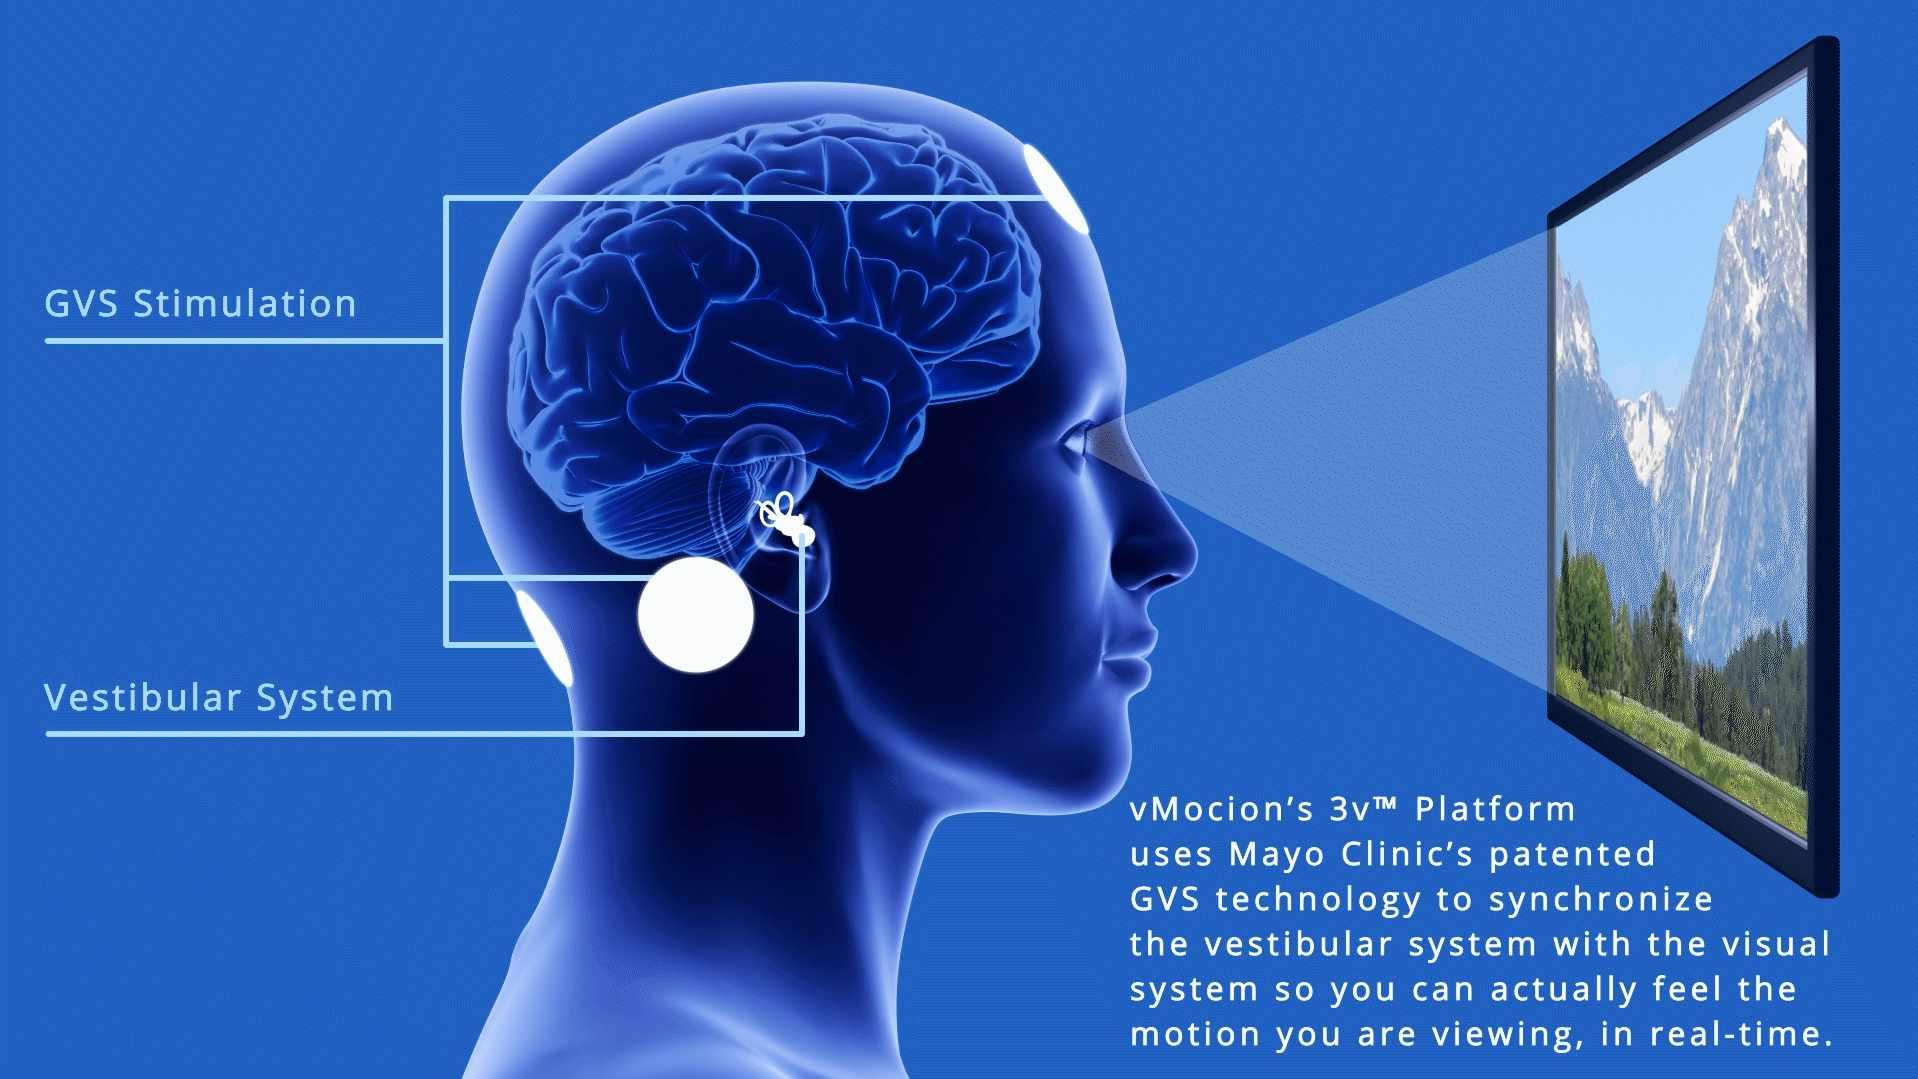 Illustration of vMocion 3v Platform attached to human brain